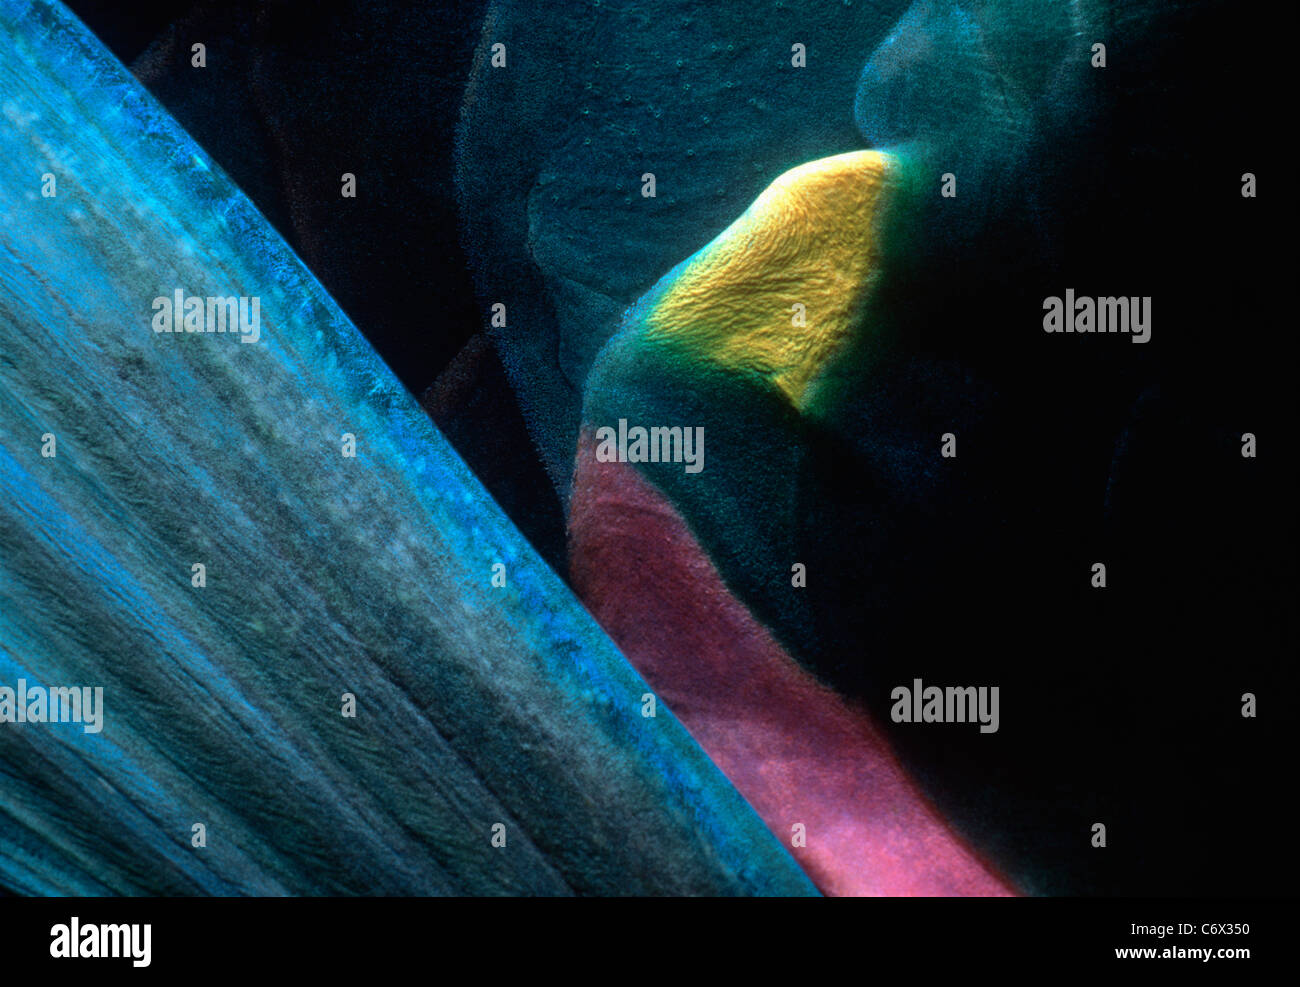 Pectoral fin of Stoplight Parrotfish (Sparisoma viride), Bahamas - Caribbean Sea - Stock Image